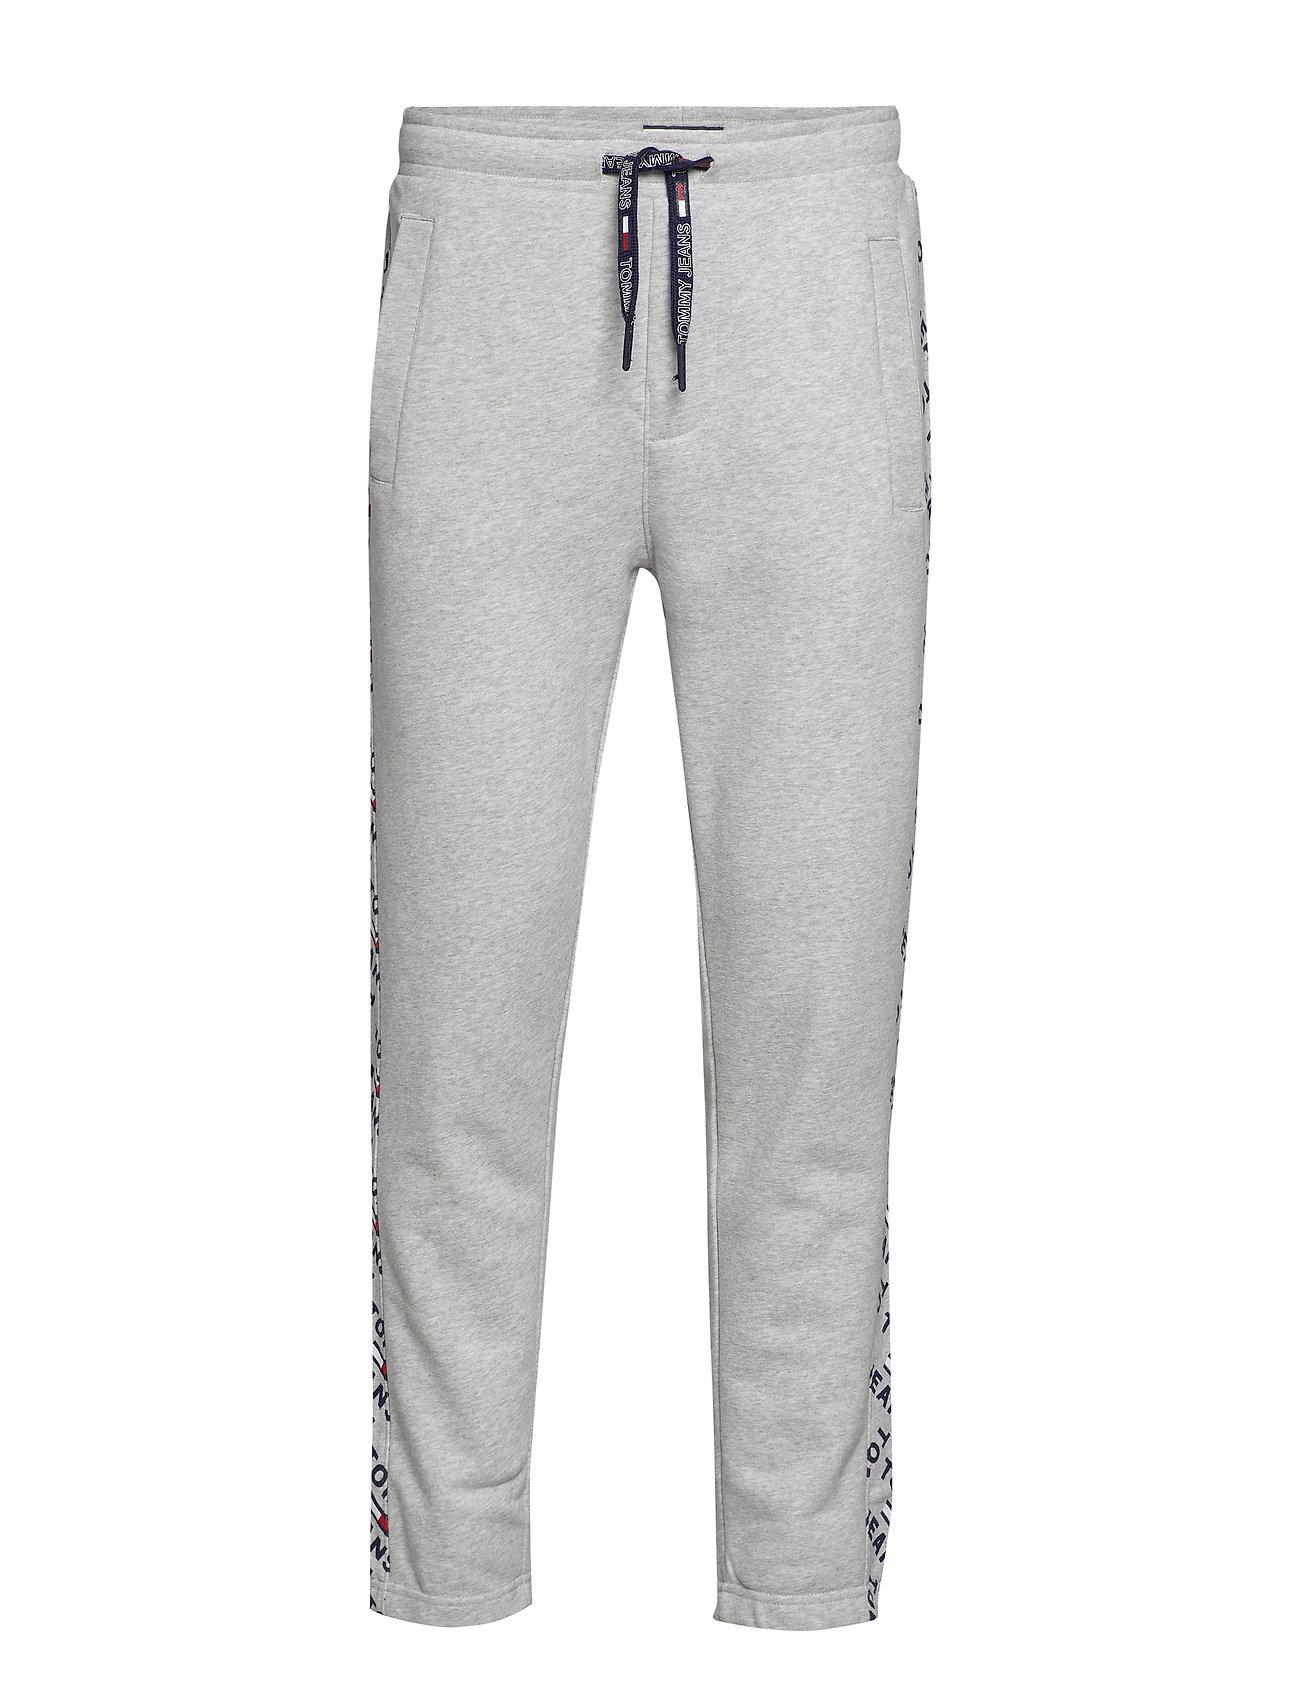 Tommy Jeans TJM CORP LOGO PRINT JOG PANT - LT GREY HTR